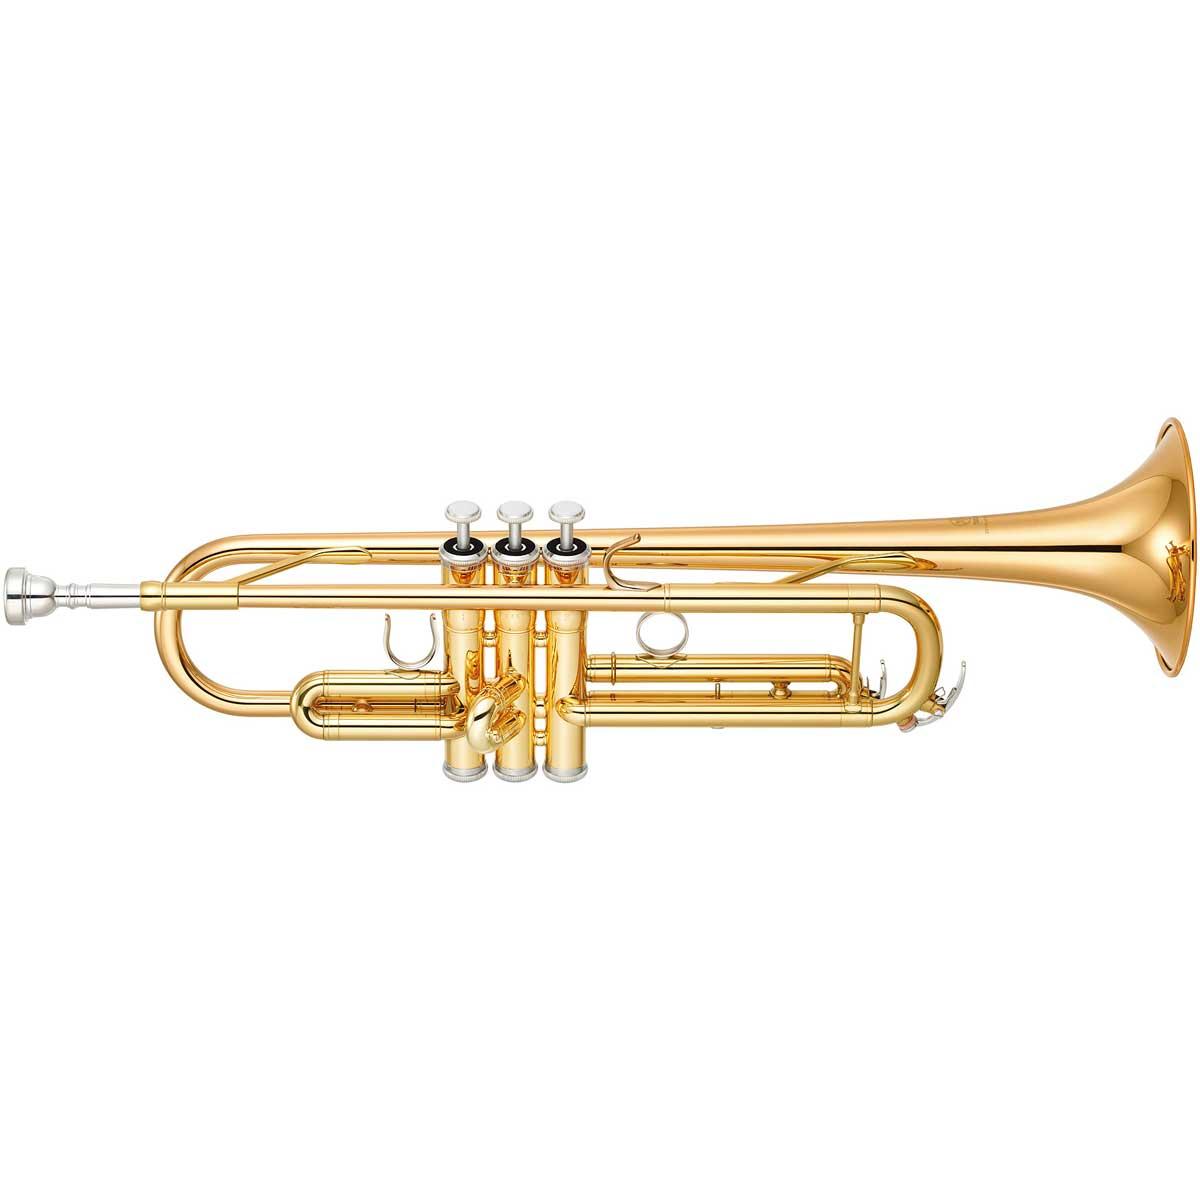 Yamaha YTR-4335 GII trompet